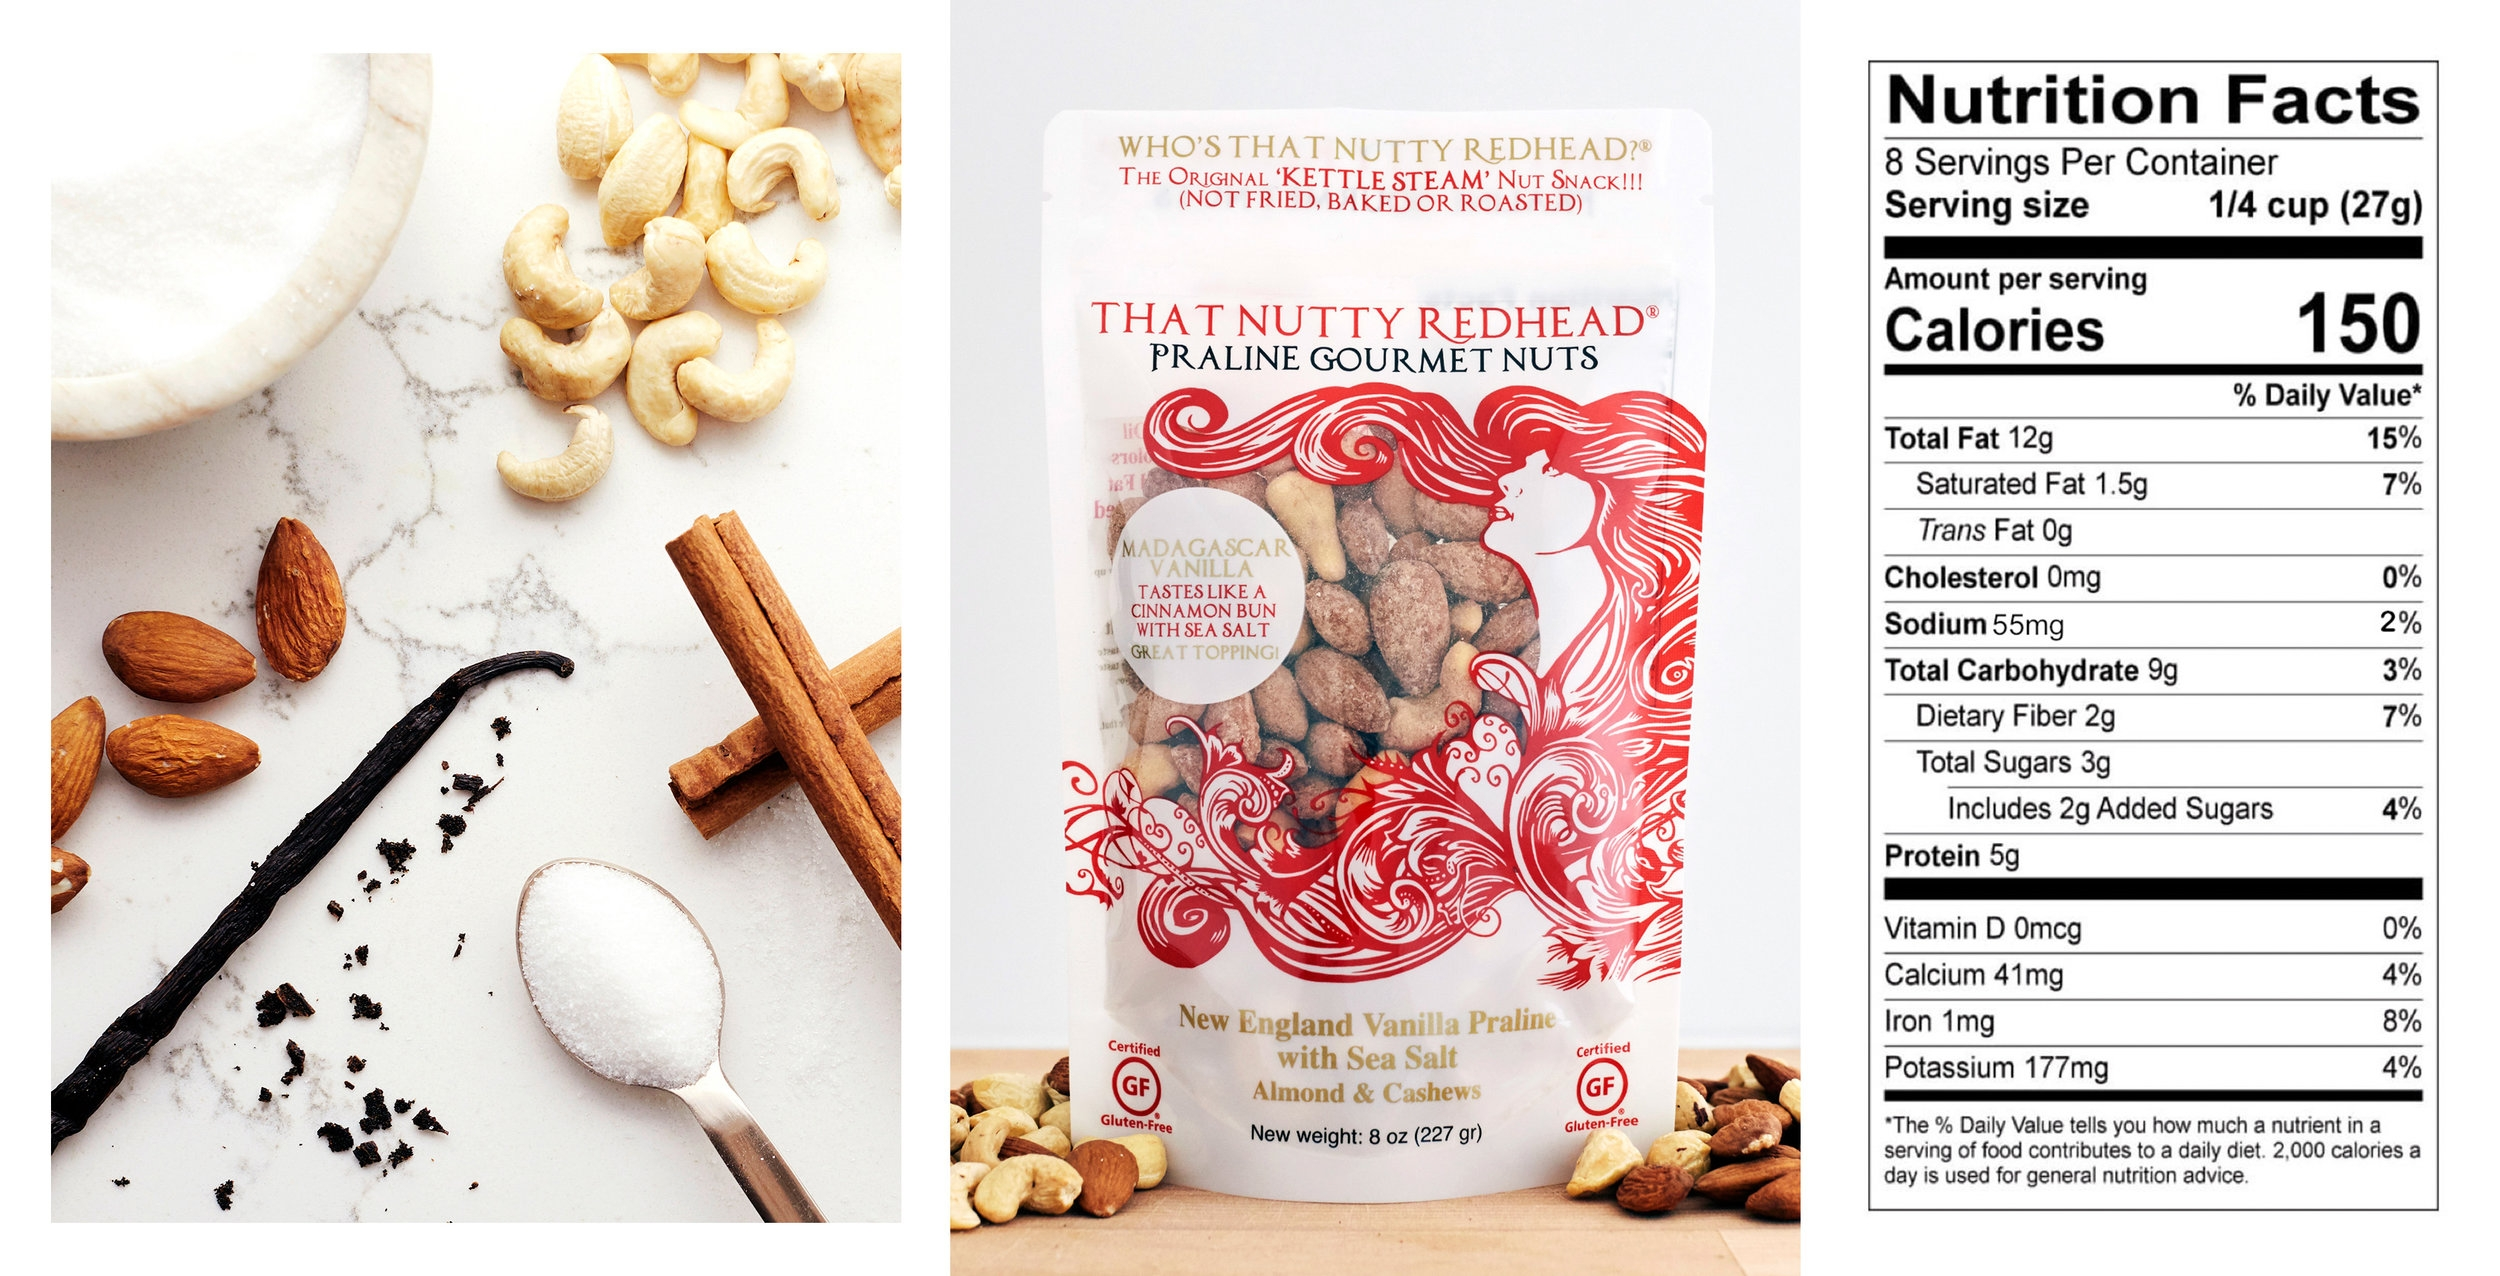 Ingredients - Almonds, Cashews, Pure Cane Sugar, Madagascar Vanilla, Cinnamon, Sea Salt